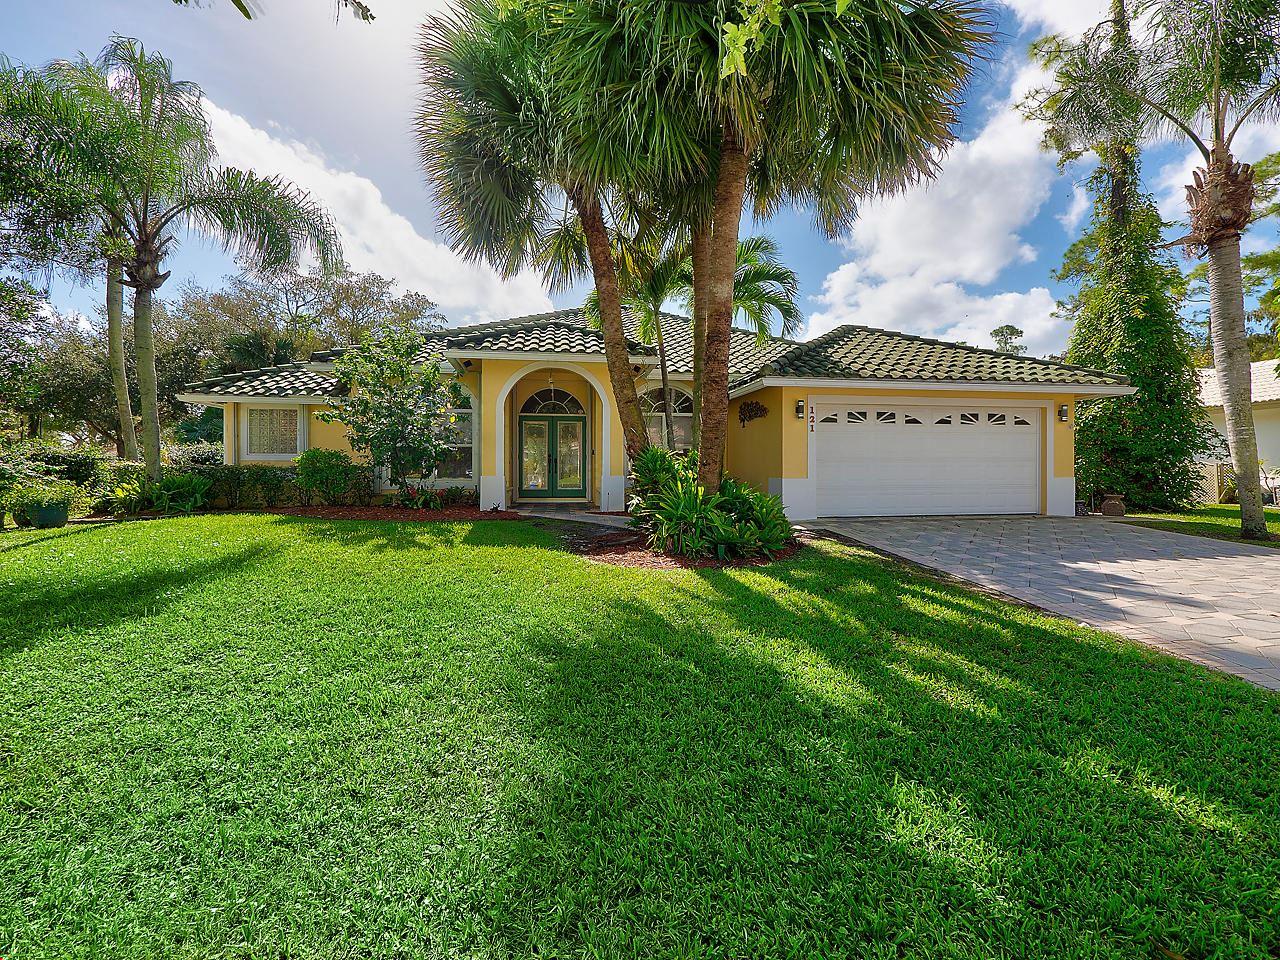 121 Cypress Crescent, Royal Palm Beach, FL 33411 - #: RX-10663222